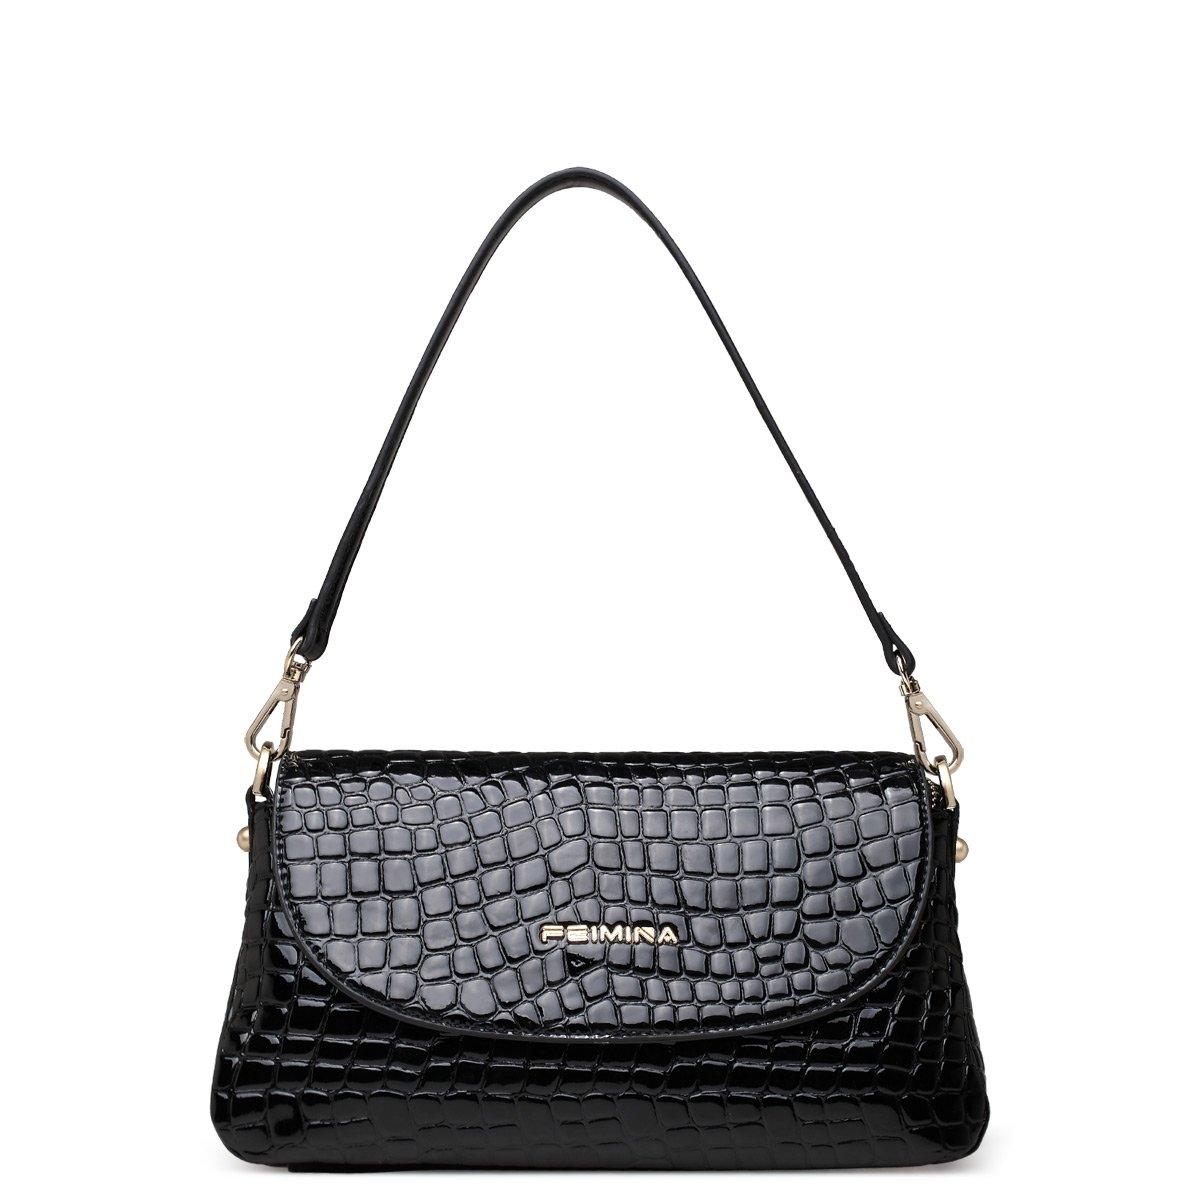 Solid Black Embossed Crocodile Cowhide Genuine Leather Envelope Flap Baguette Bag Casual Party Women Small Crossbody Shoulder Bag